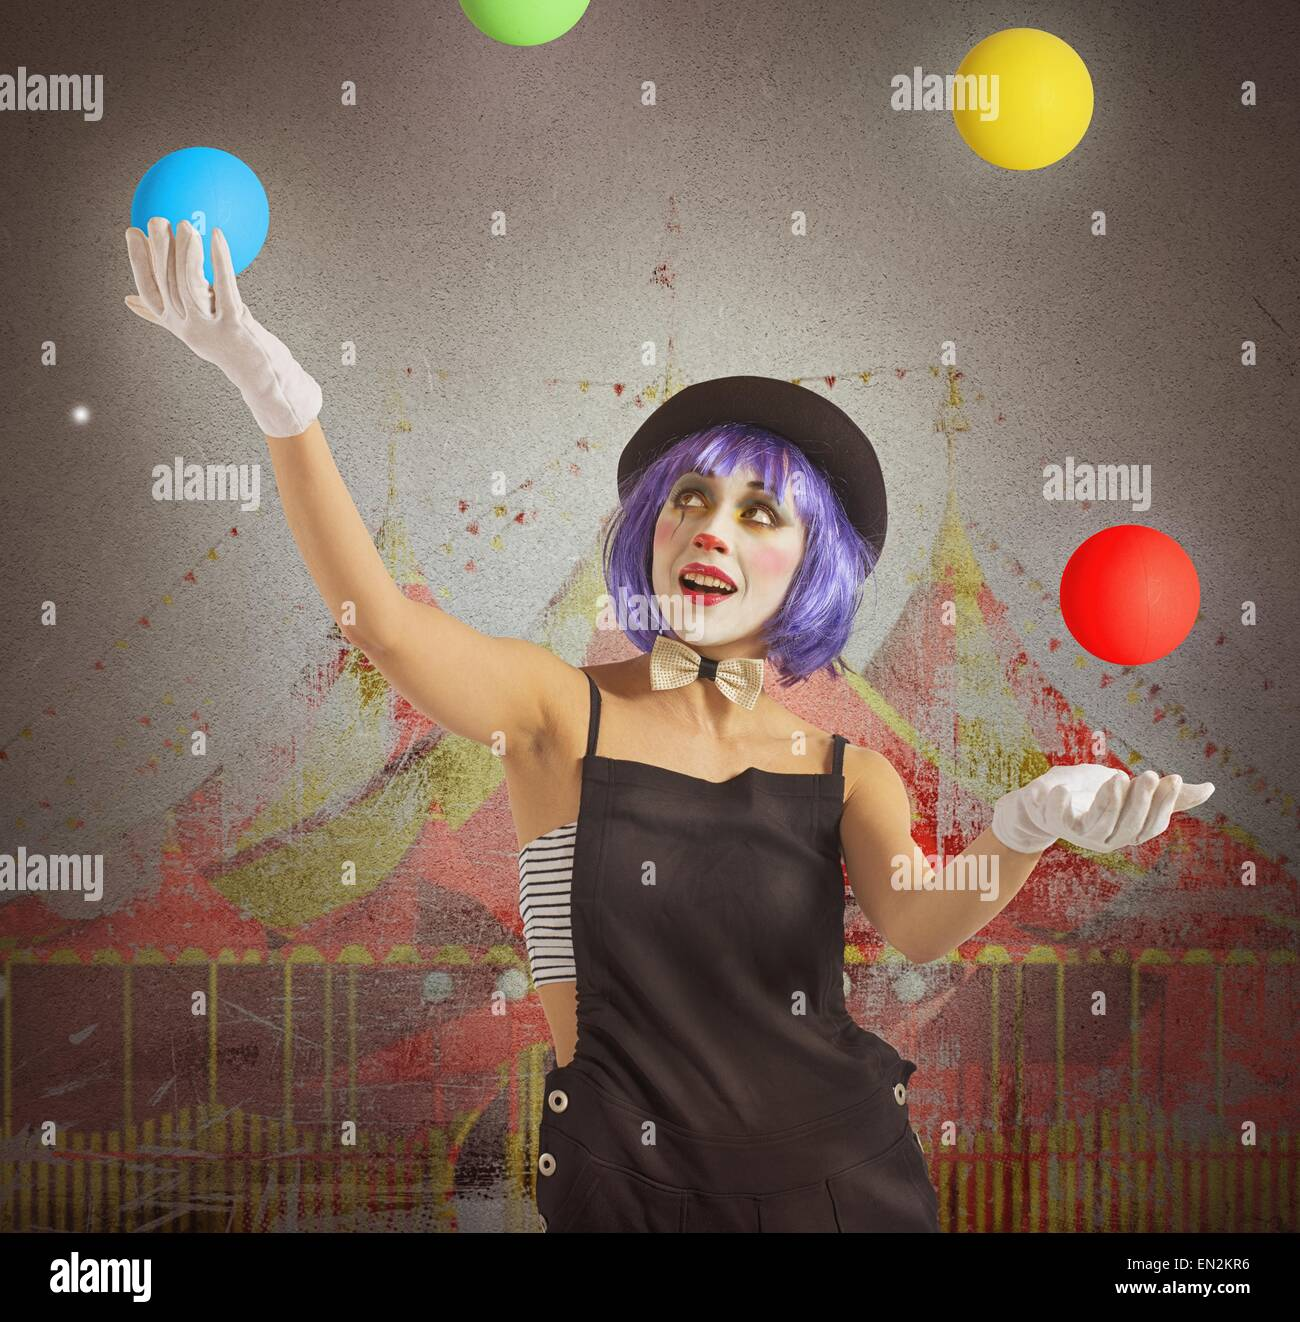 Juggler clown - Stock Image